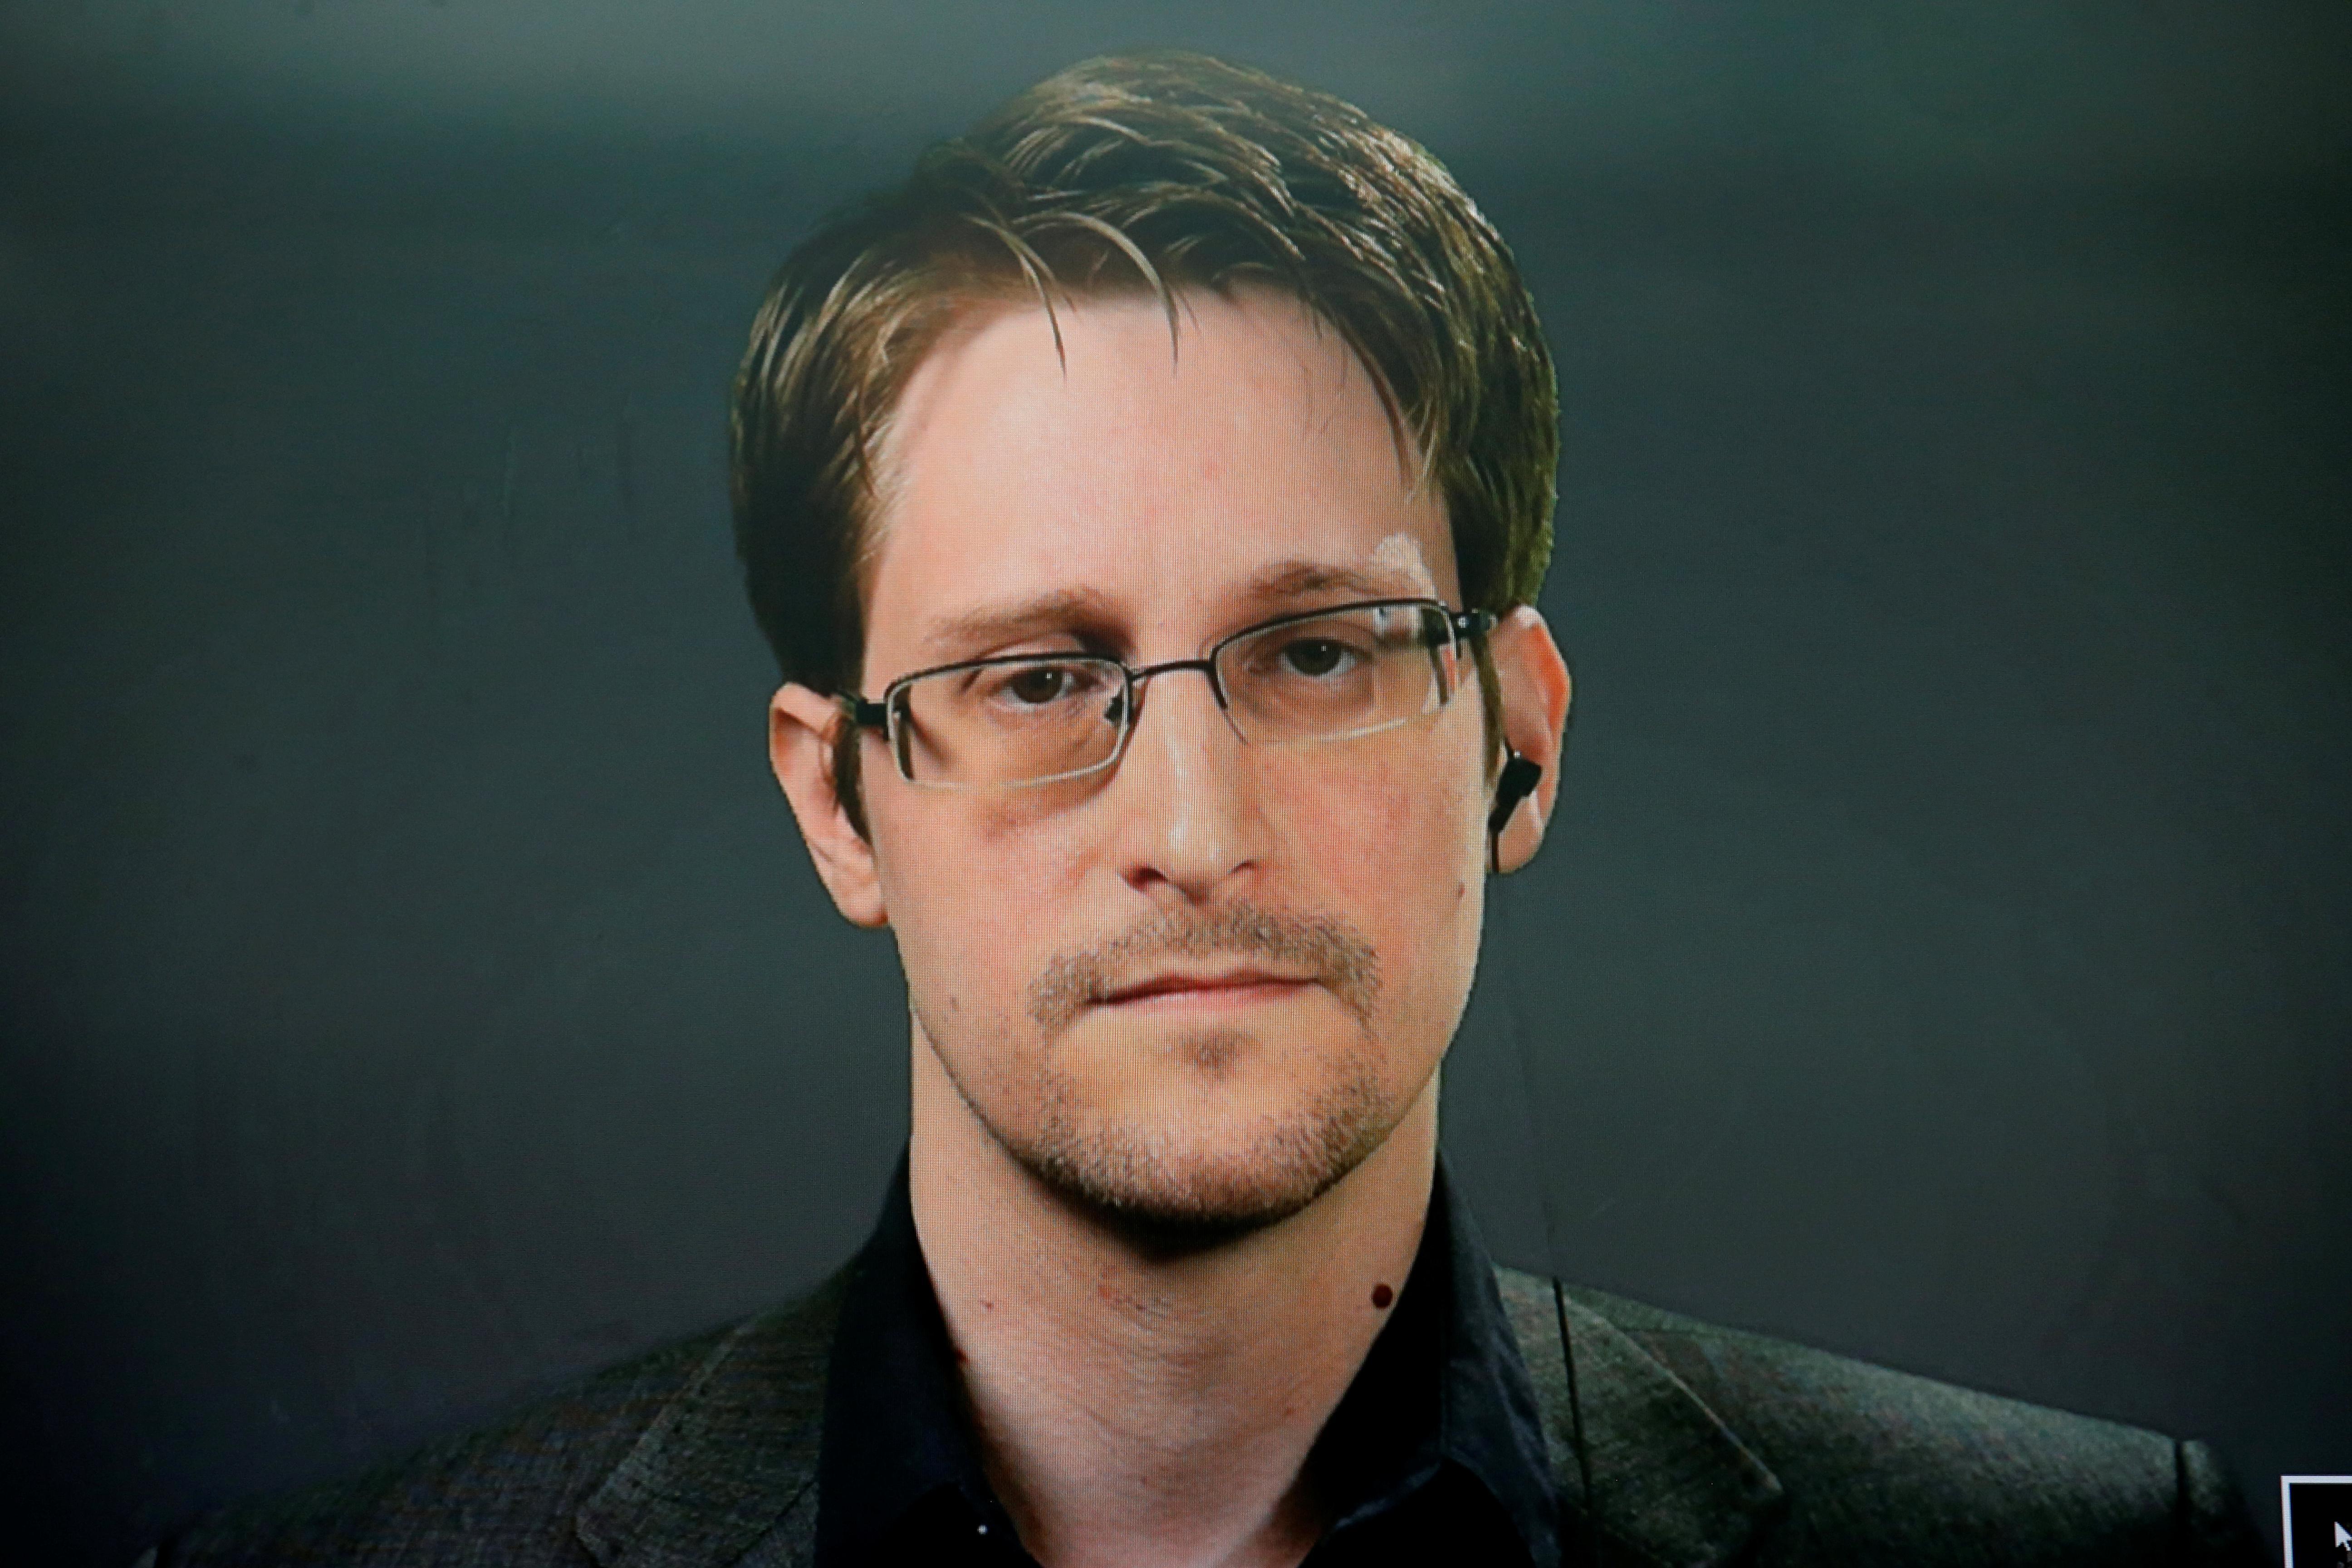 Snowden says he hopes France will grant him asylum